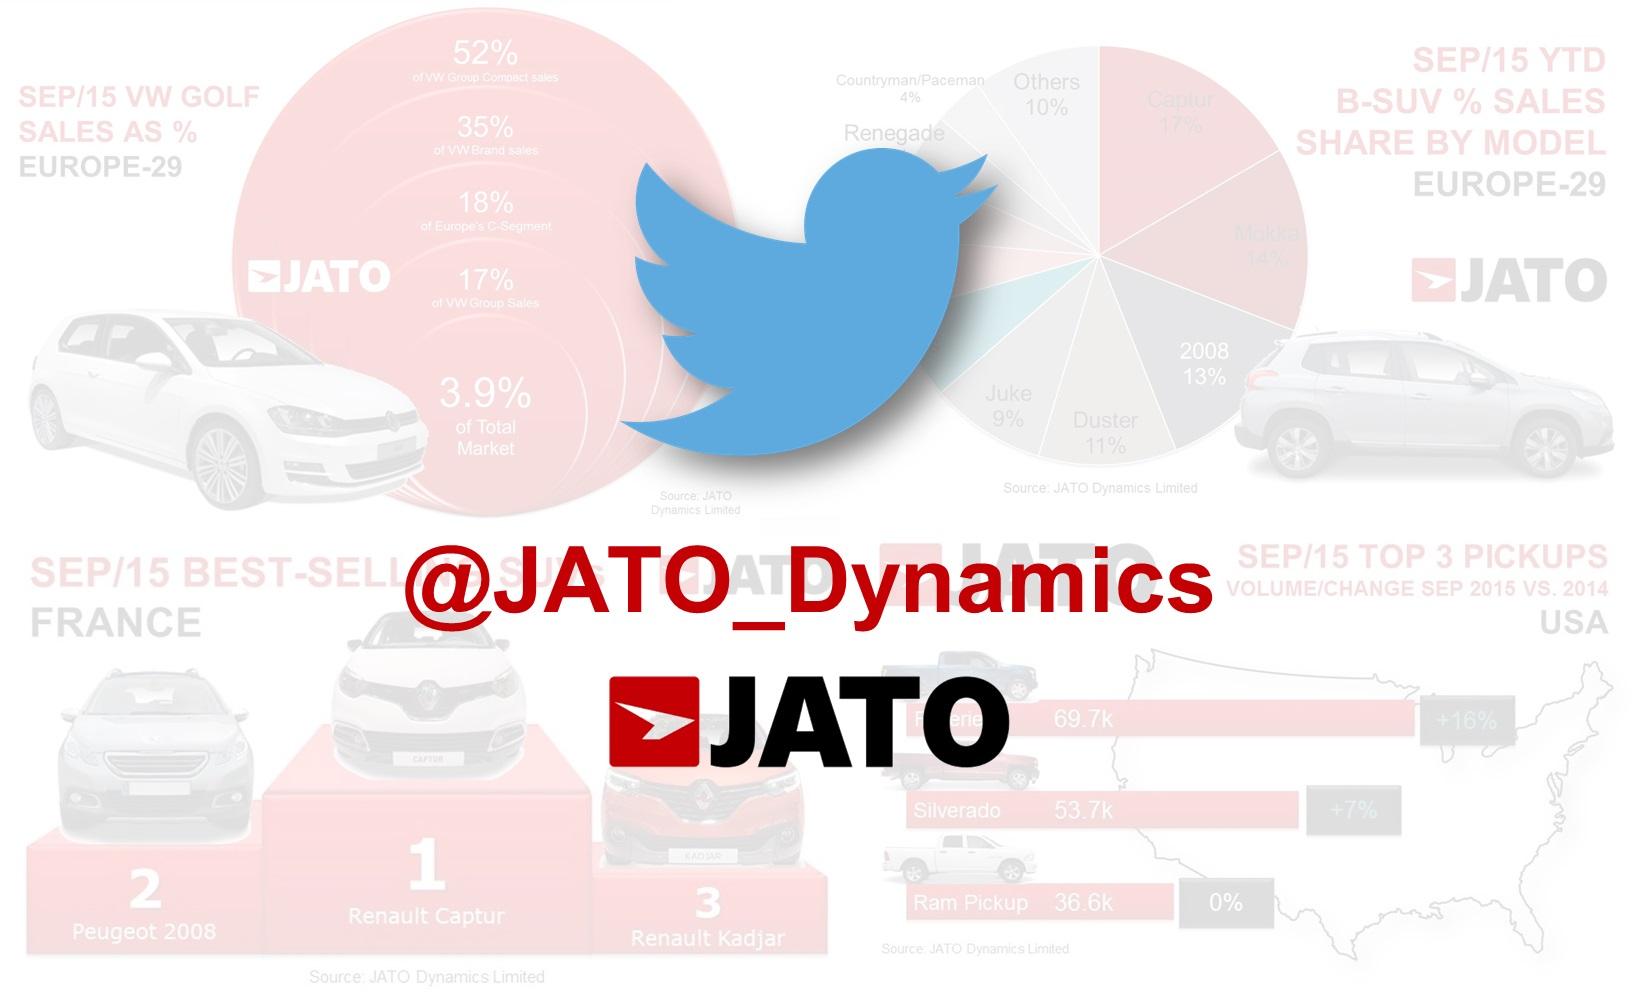 JATOのtwitter公式アカウントのフォローを宜しくお願いします